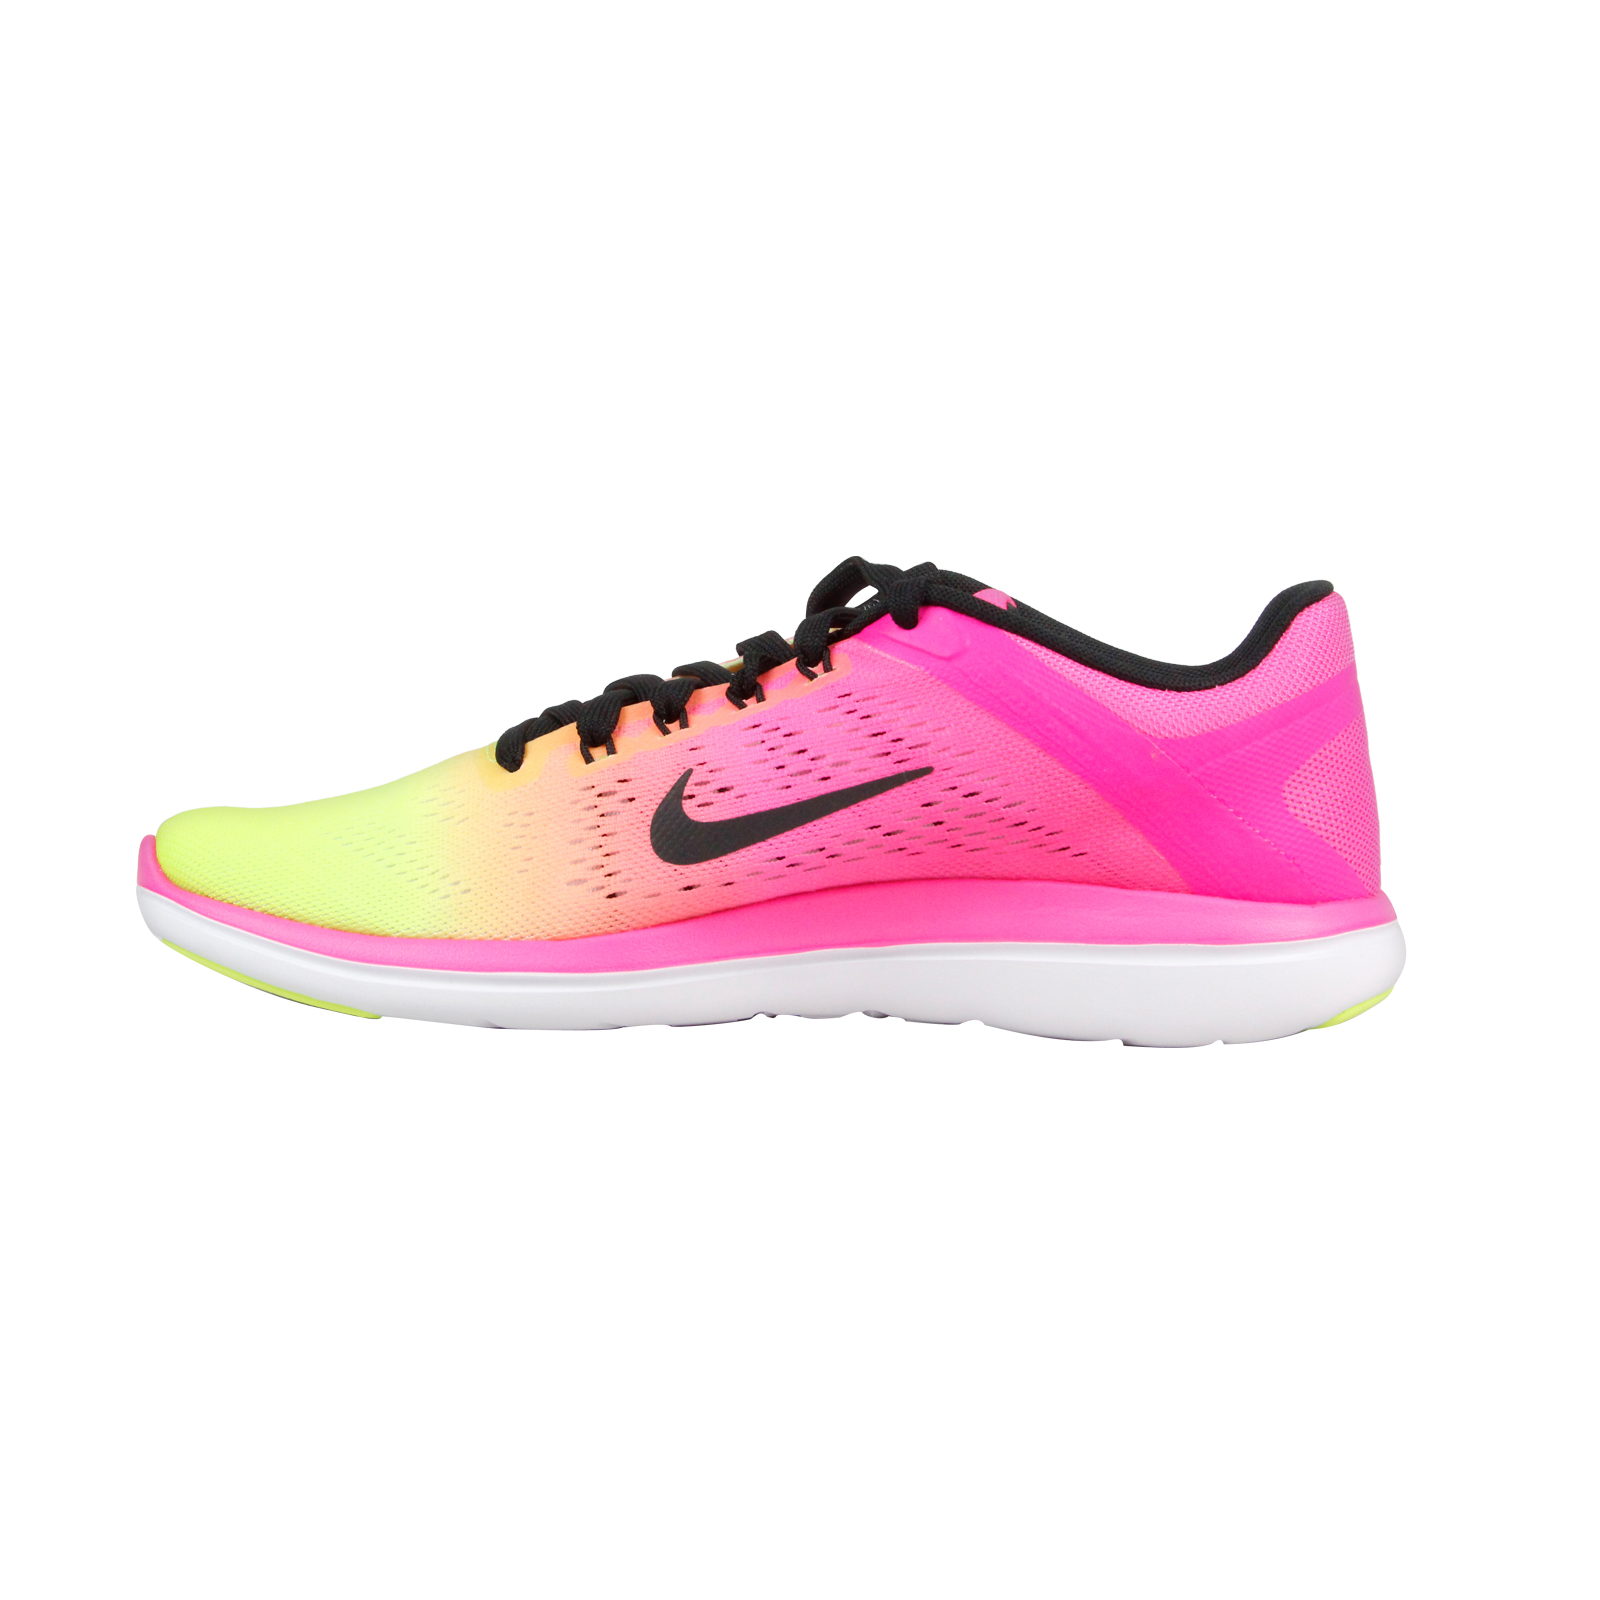 Nike Men's Flex 2016 Rn Oc Multi-Color/Multi-Color Ankle-High Mesh Cross Trainer Shoe - 9M